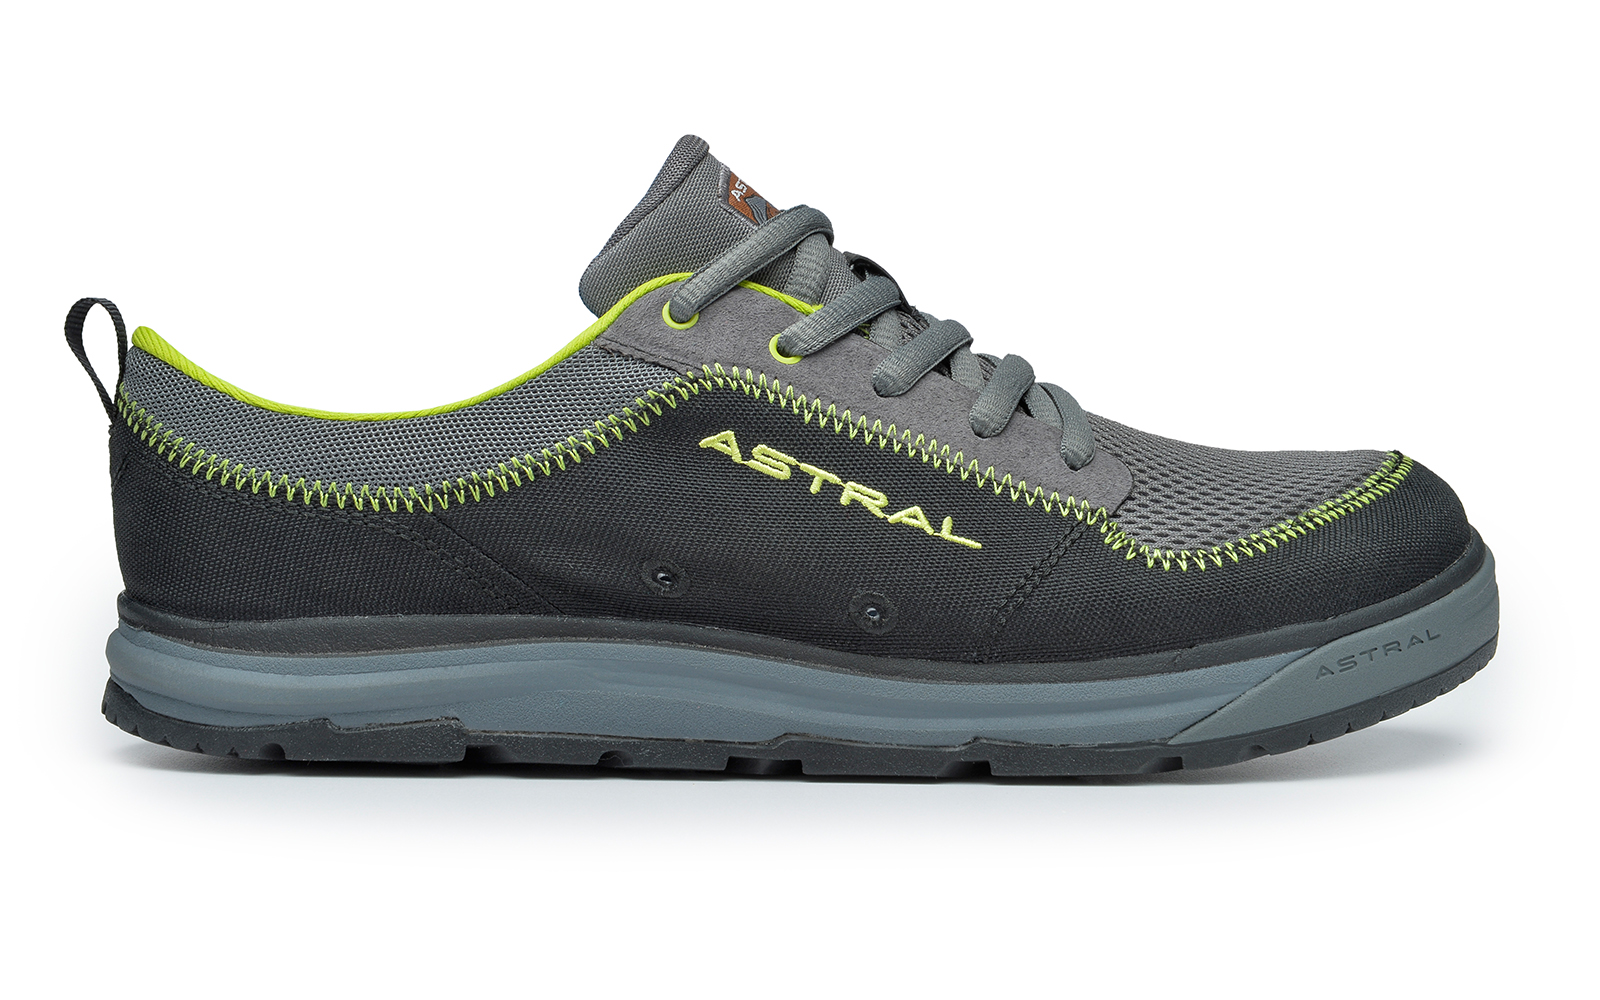 2021 Astral Brewer 2.0 UK Super Sticky Watersports Shoe Black Mens